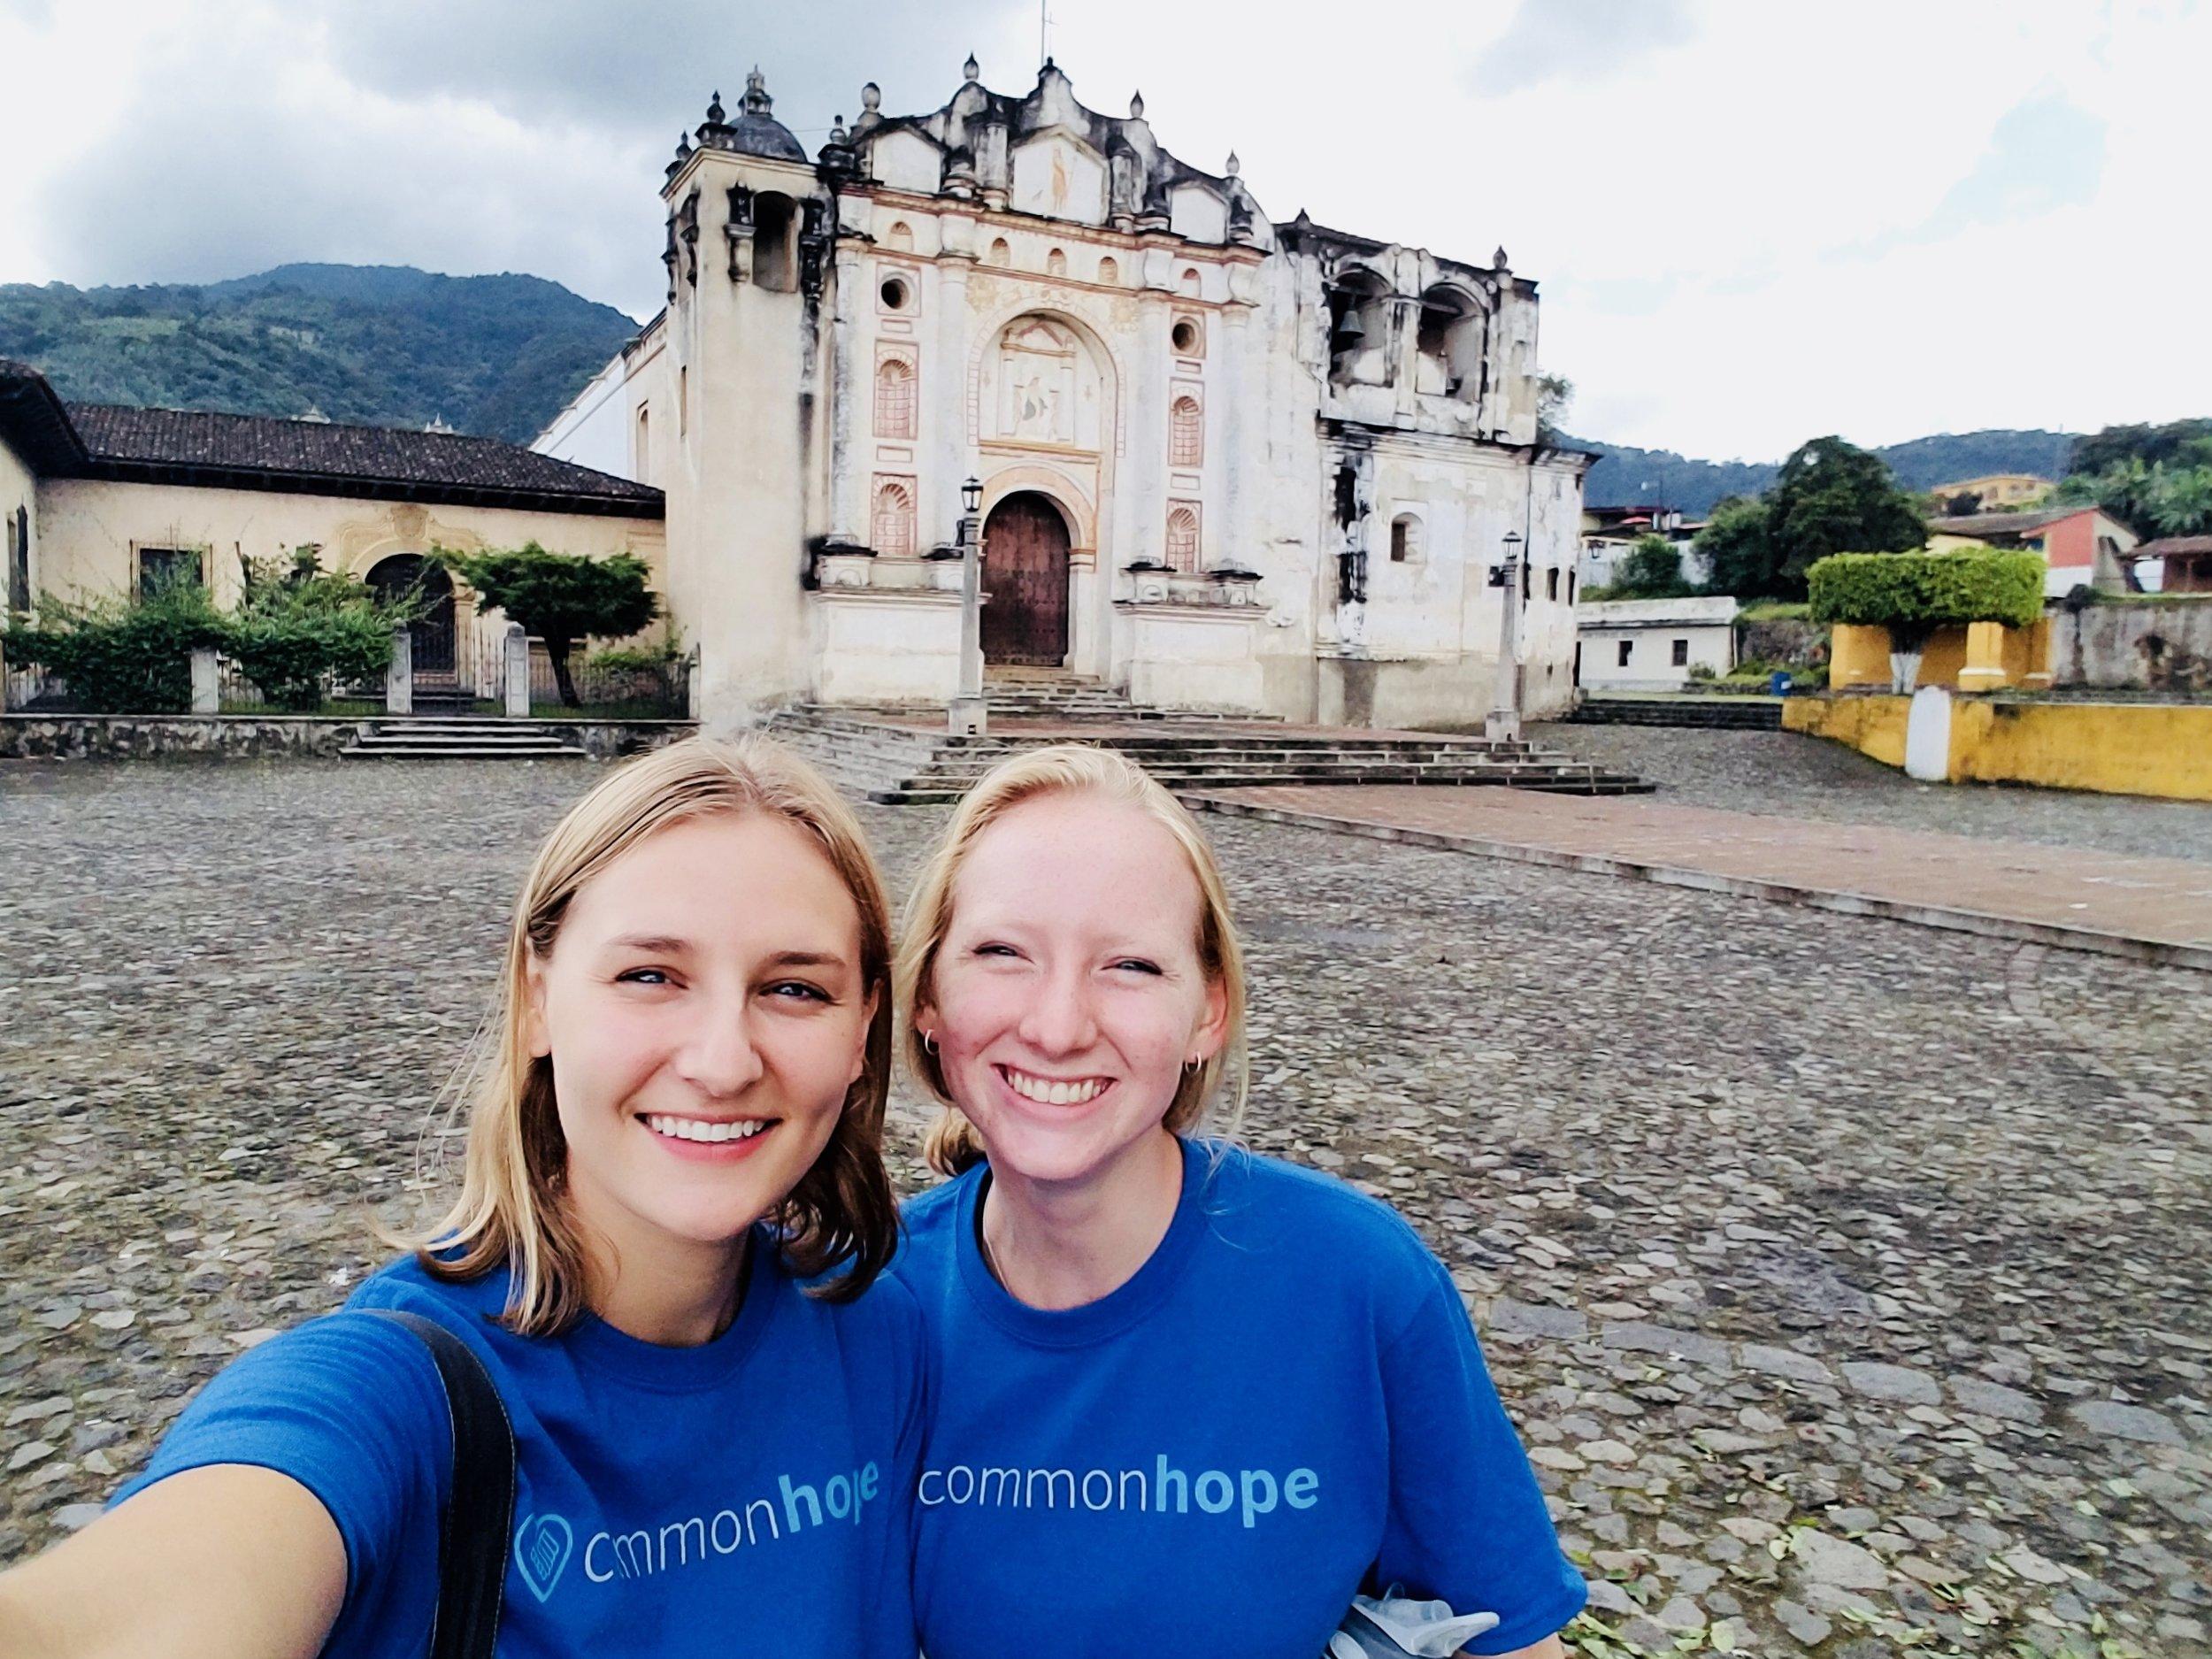 Touring the sights of Antigua, Guatemala.